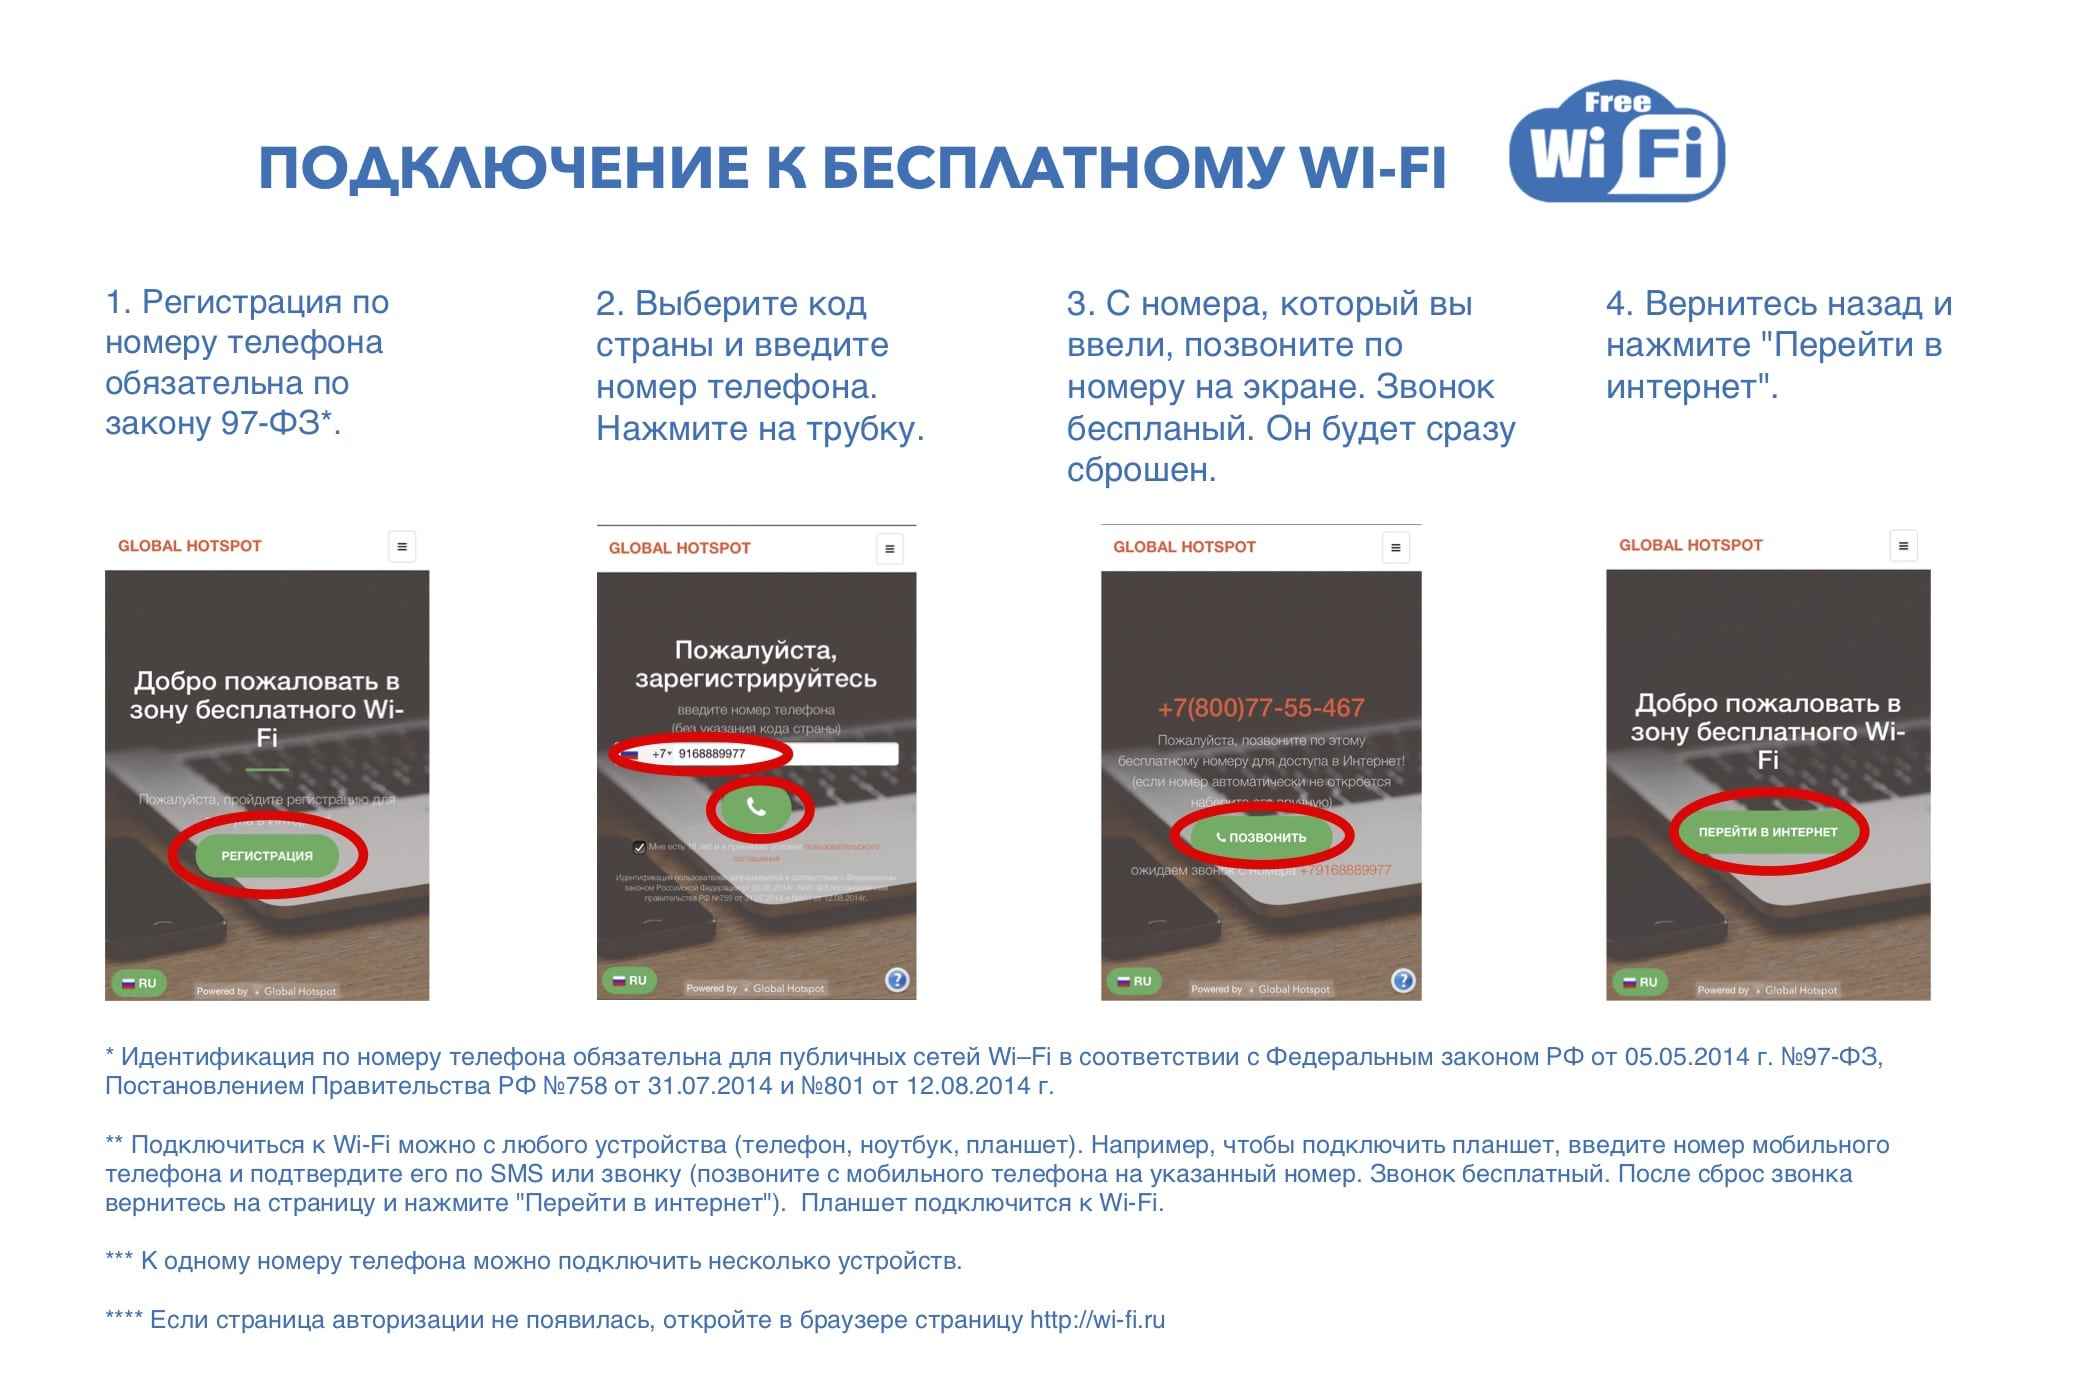 памятка Wi-Fi авторизация